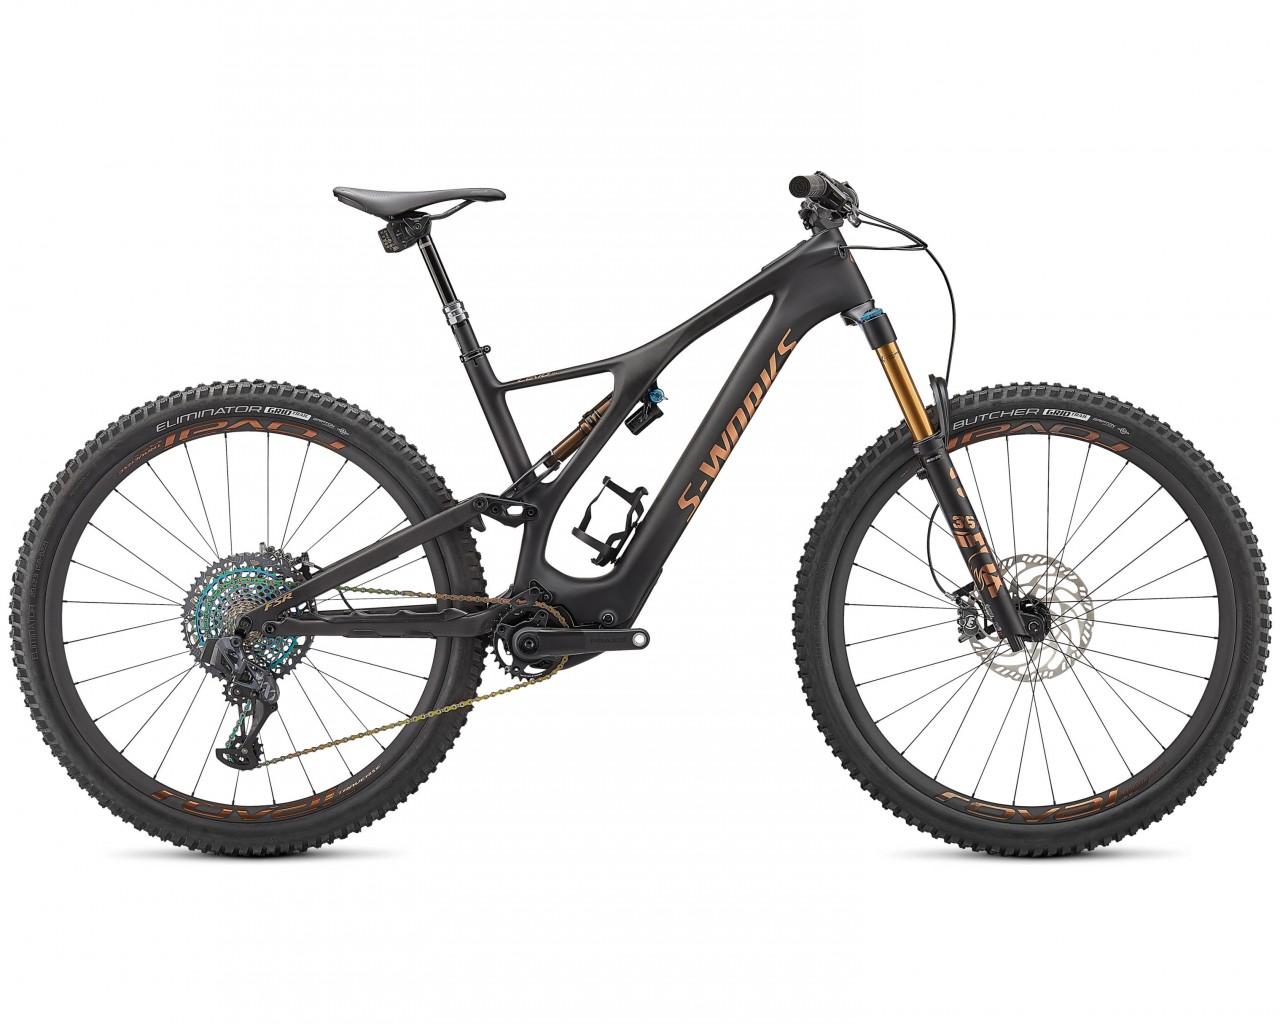 Specialized S-Works Levo SL Carbon 29 - Elektro Carbon MTB Fully 2021 | carbon-bronze foil-glos carb